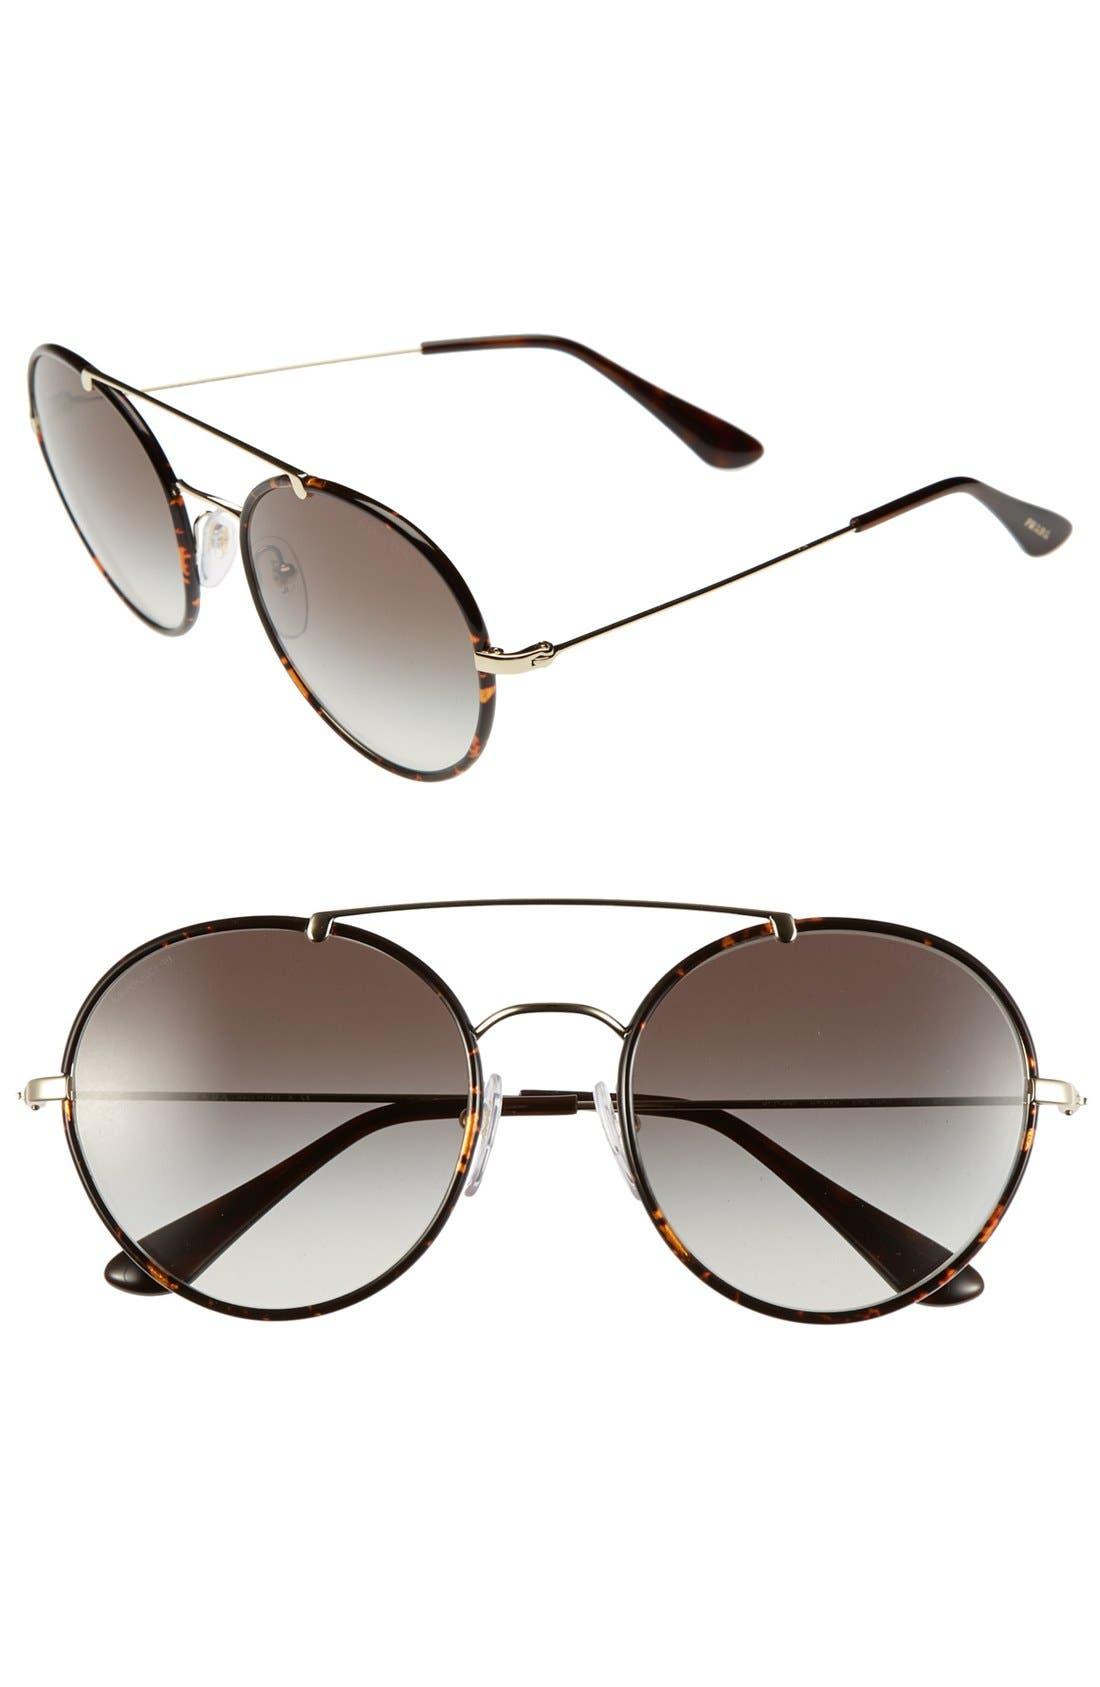 Main Image - Prada 54mm Retro Sunglasses